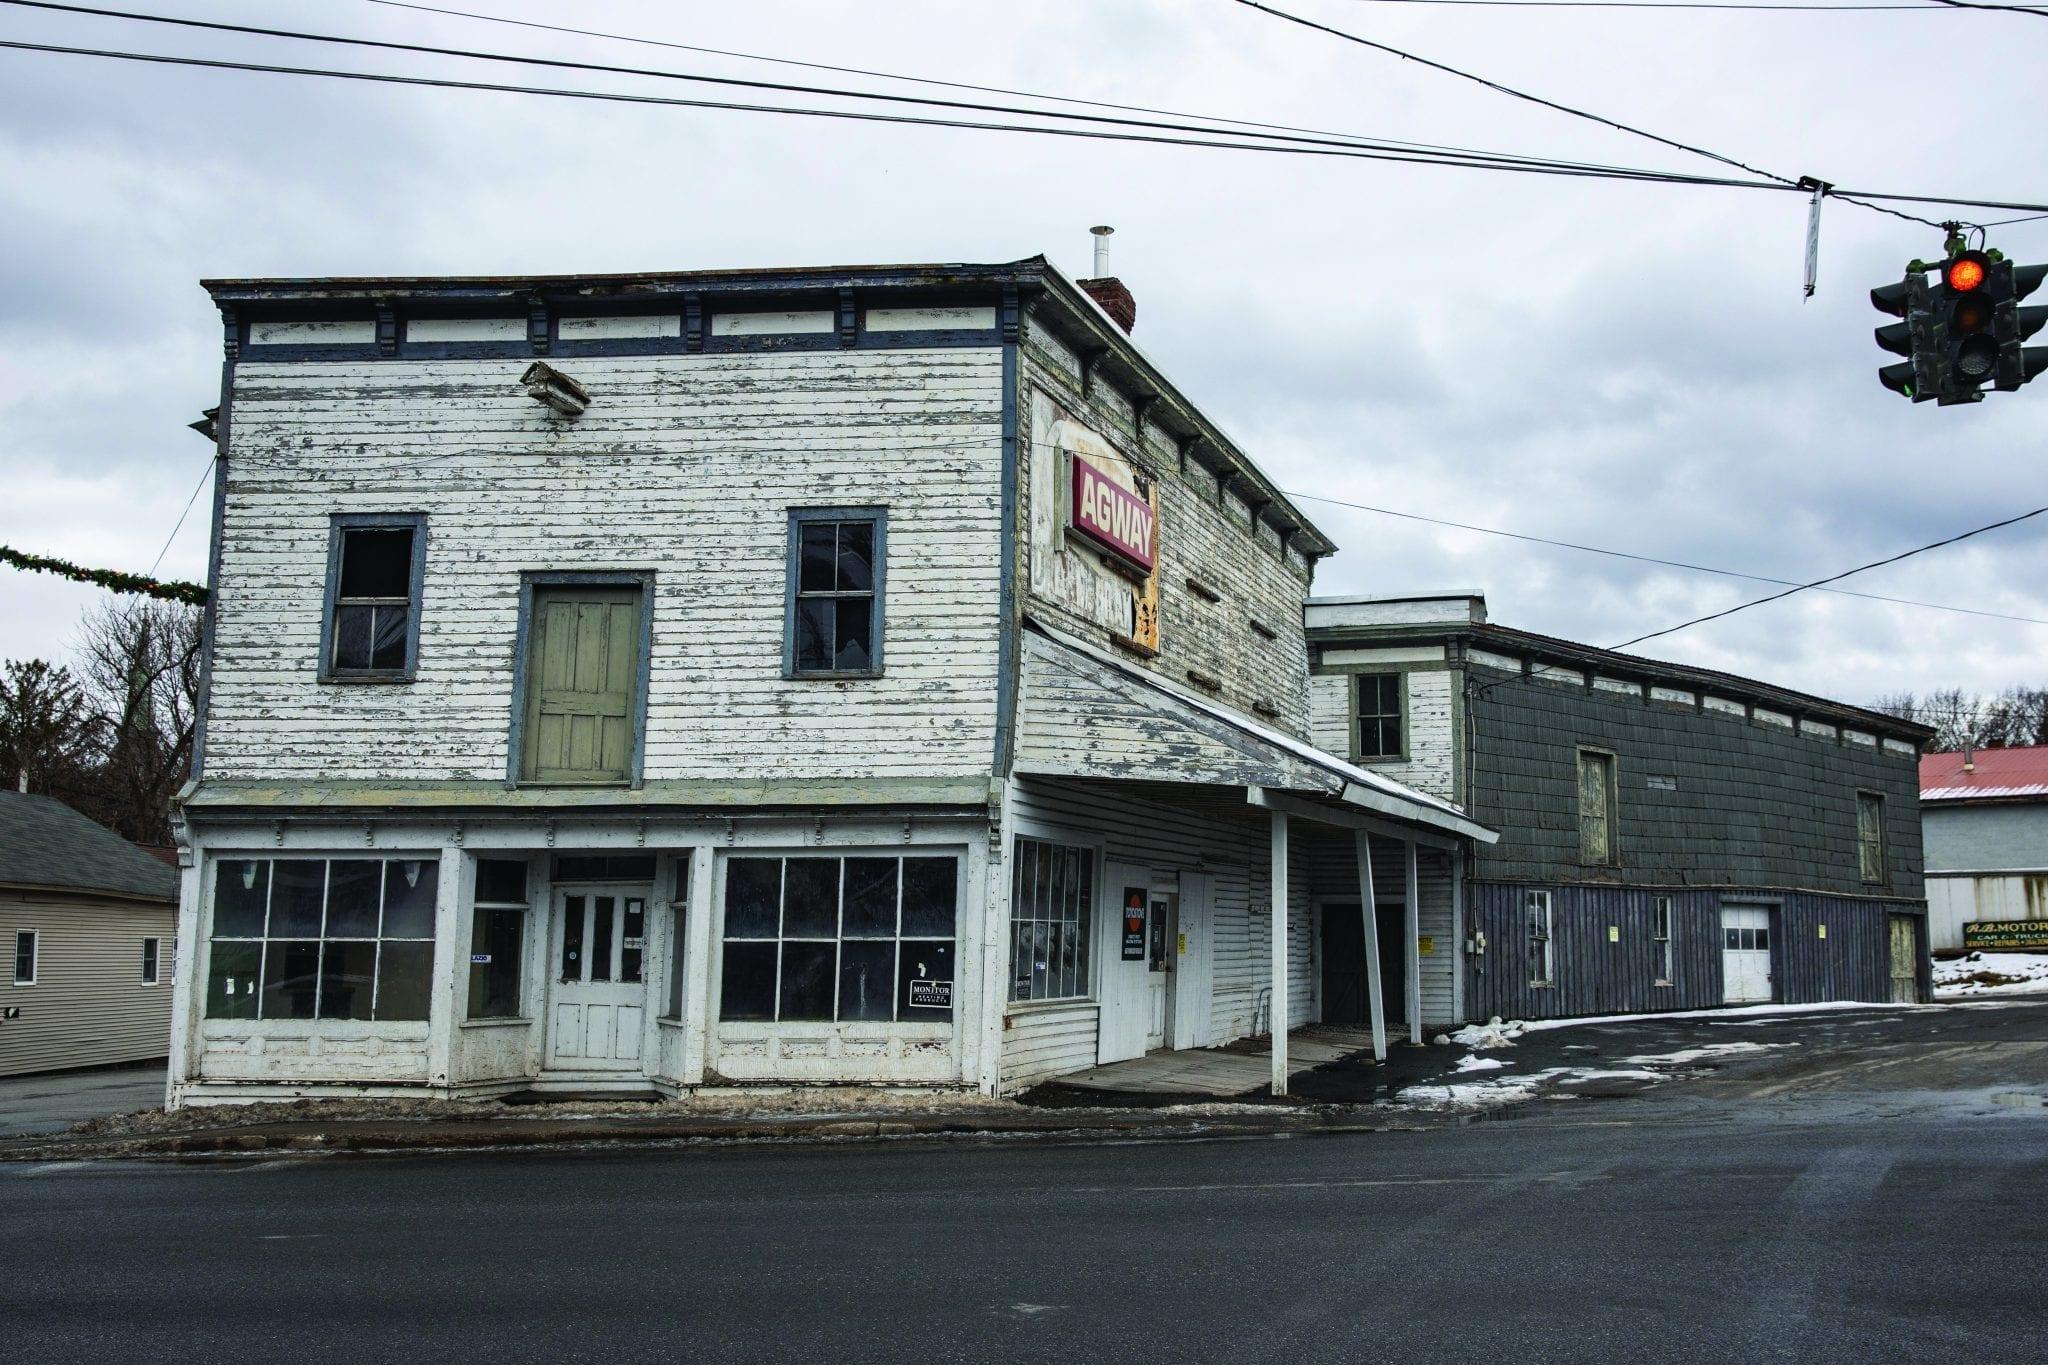 Ticonderoga zombie property, by Mike Lynch